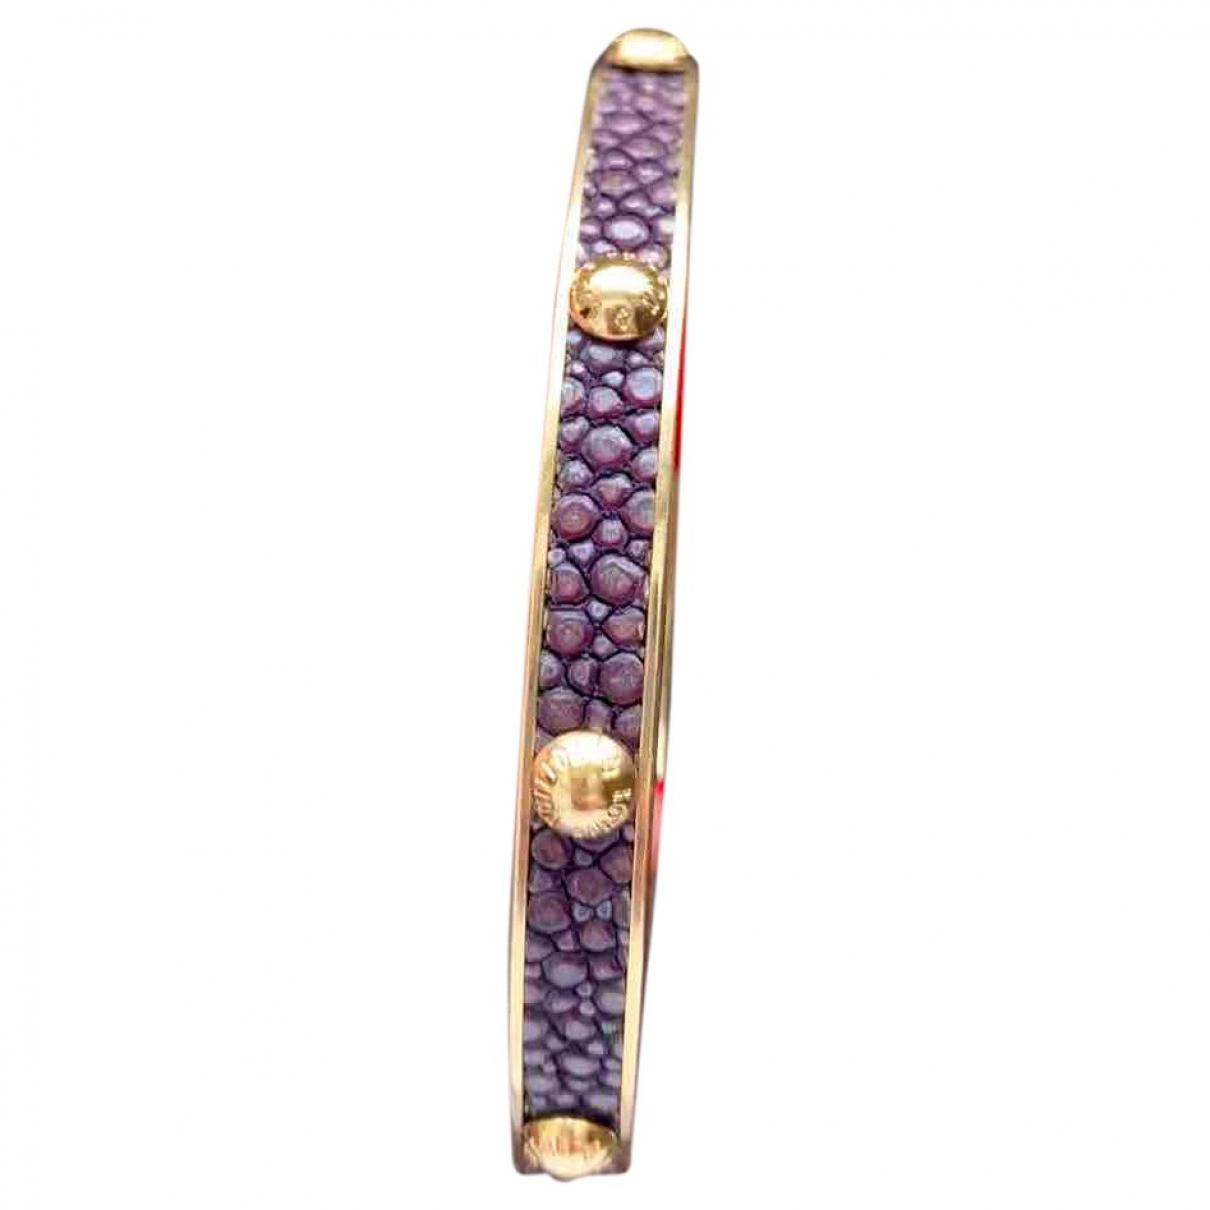 Louis Vuitton Empreinte Armband in  Braun Metall